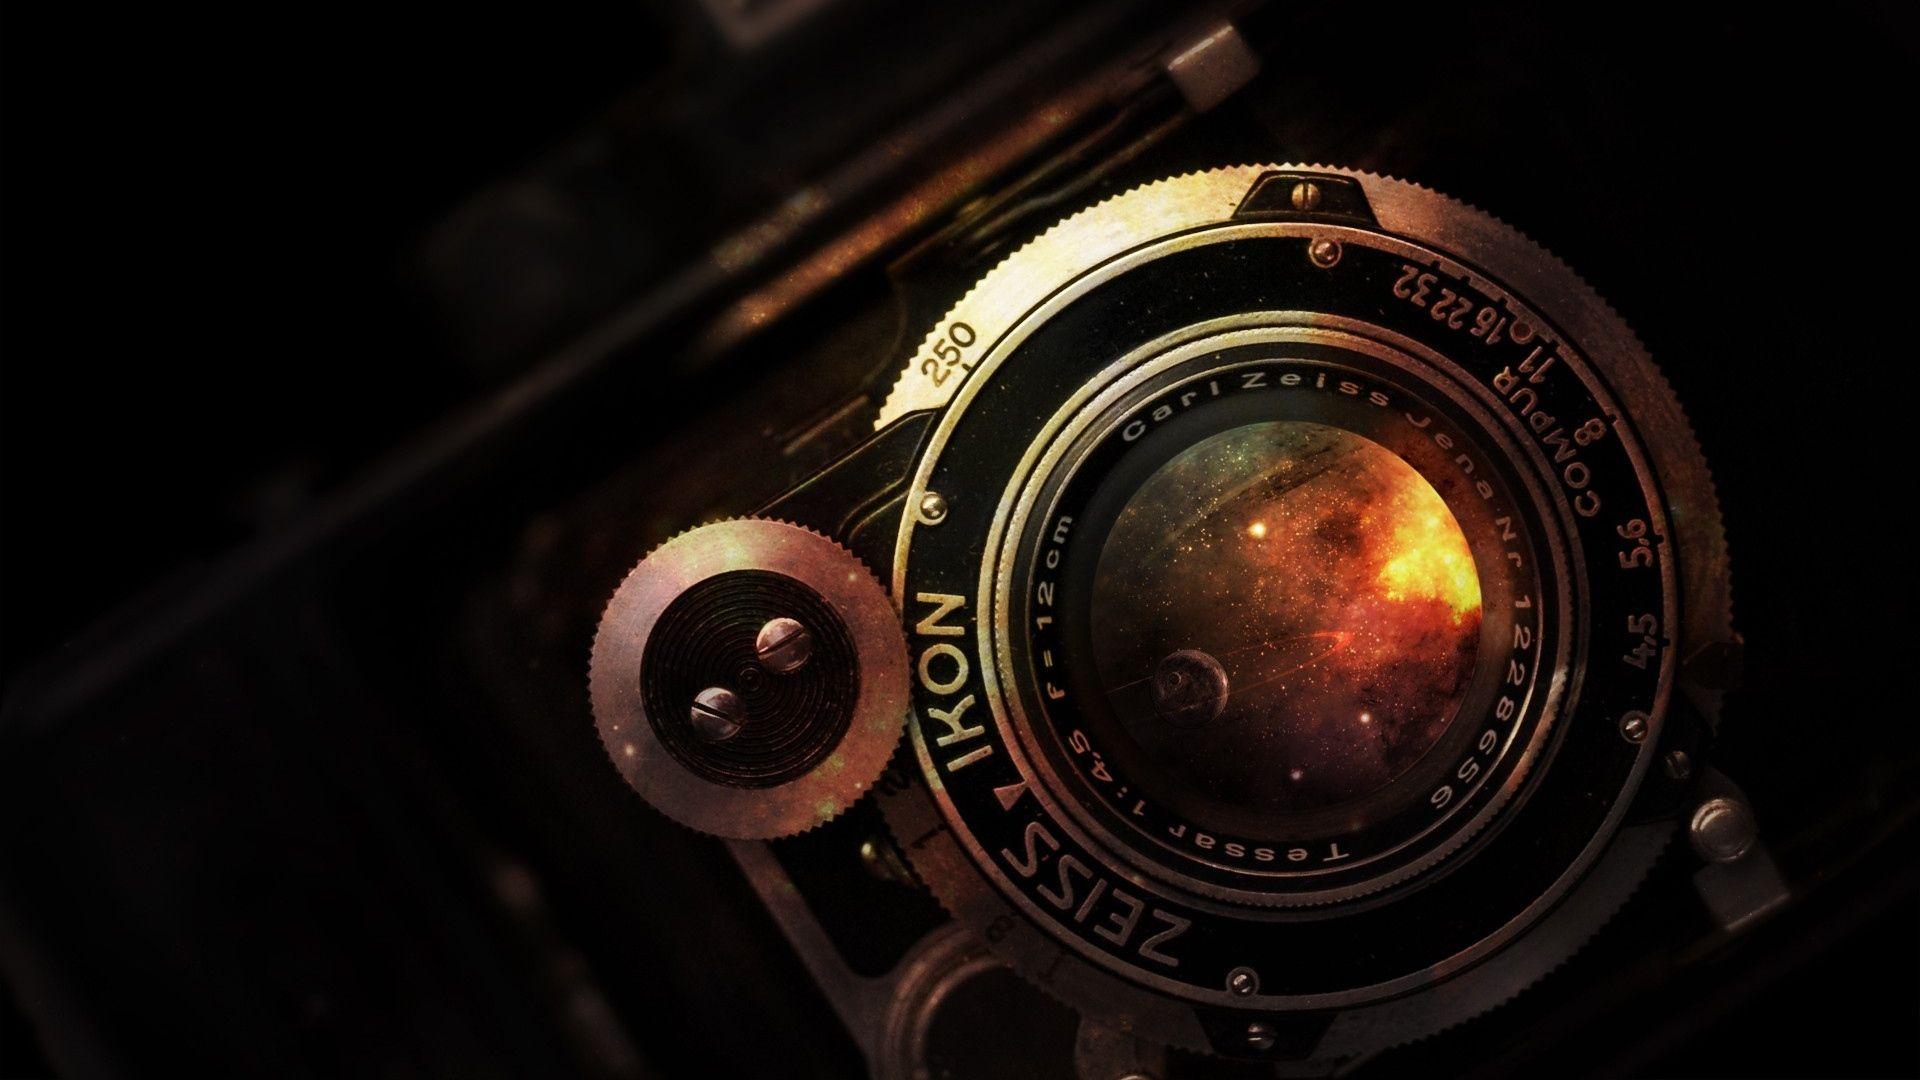 Download Wallpaper 1920x1080 Camera Lens Vintage Rarity Nikon